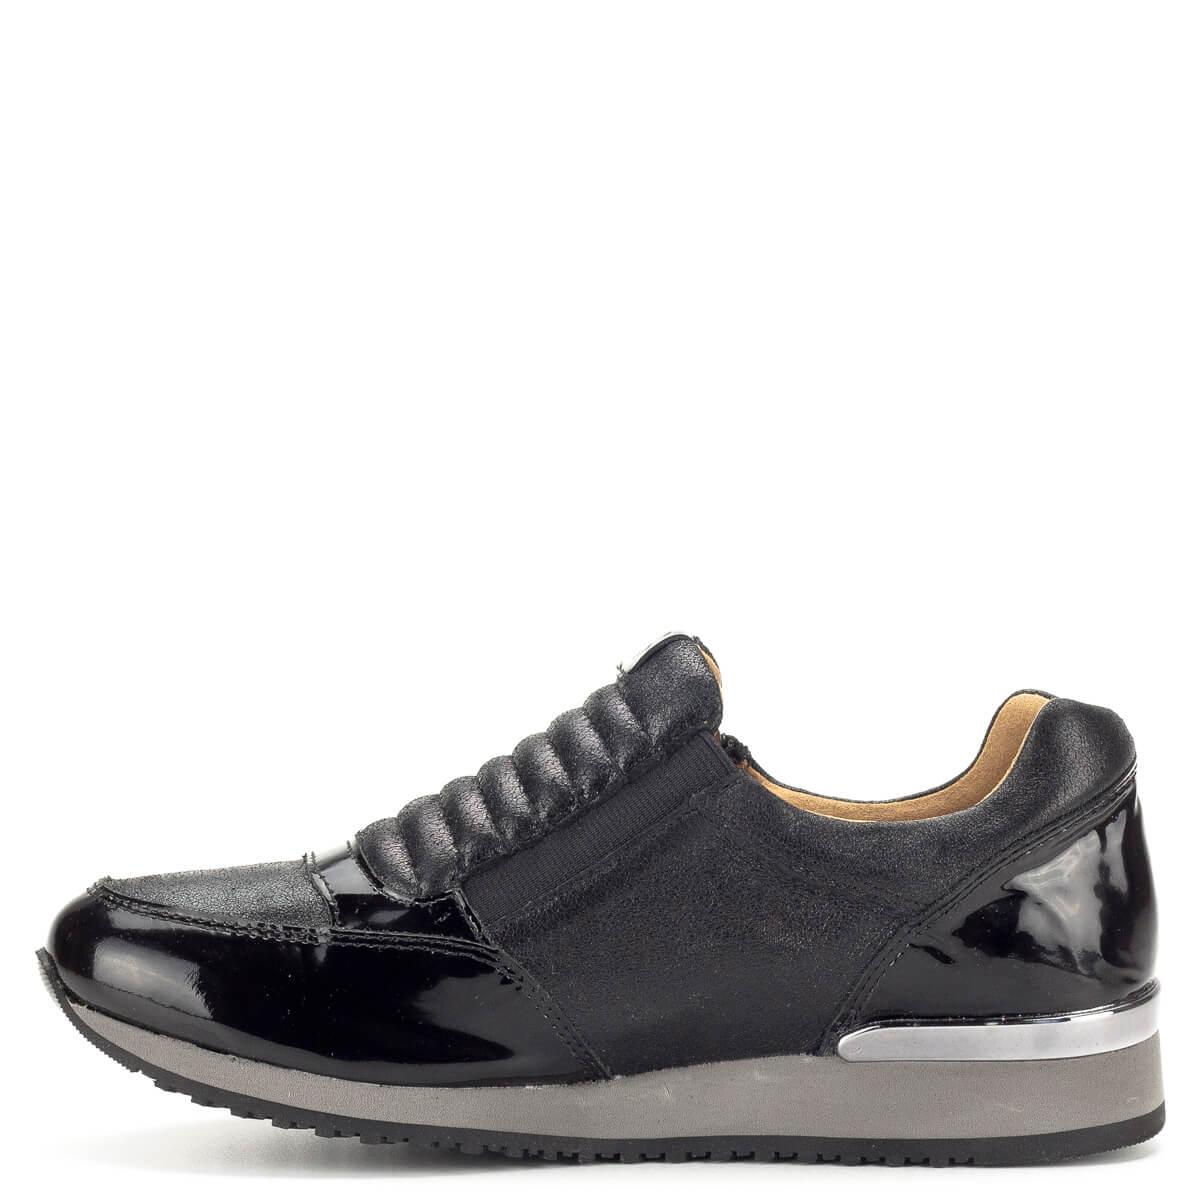 e459962b25b2 ... Fekete sportos Caprice női cipő - Caprice cipők - Utcai cipők - Caprice  9-24605